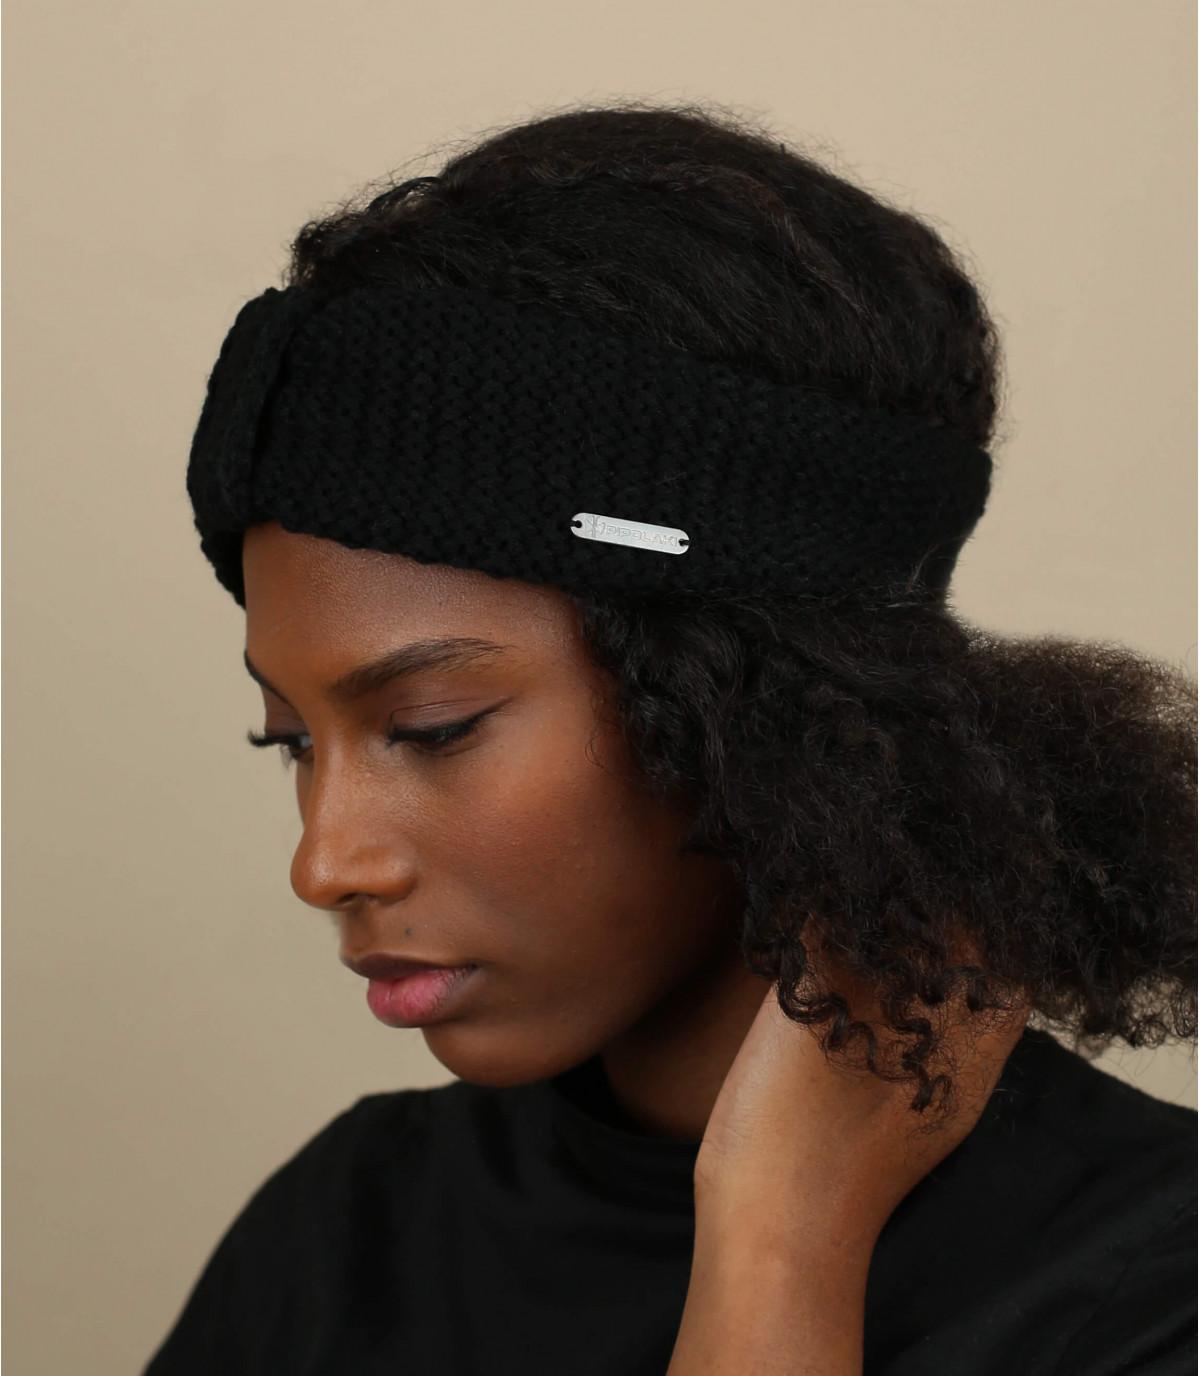 zwarte gebreide hoofdband